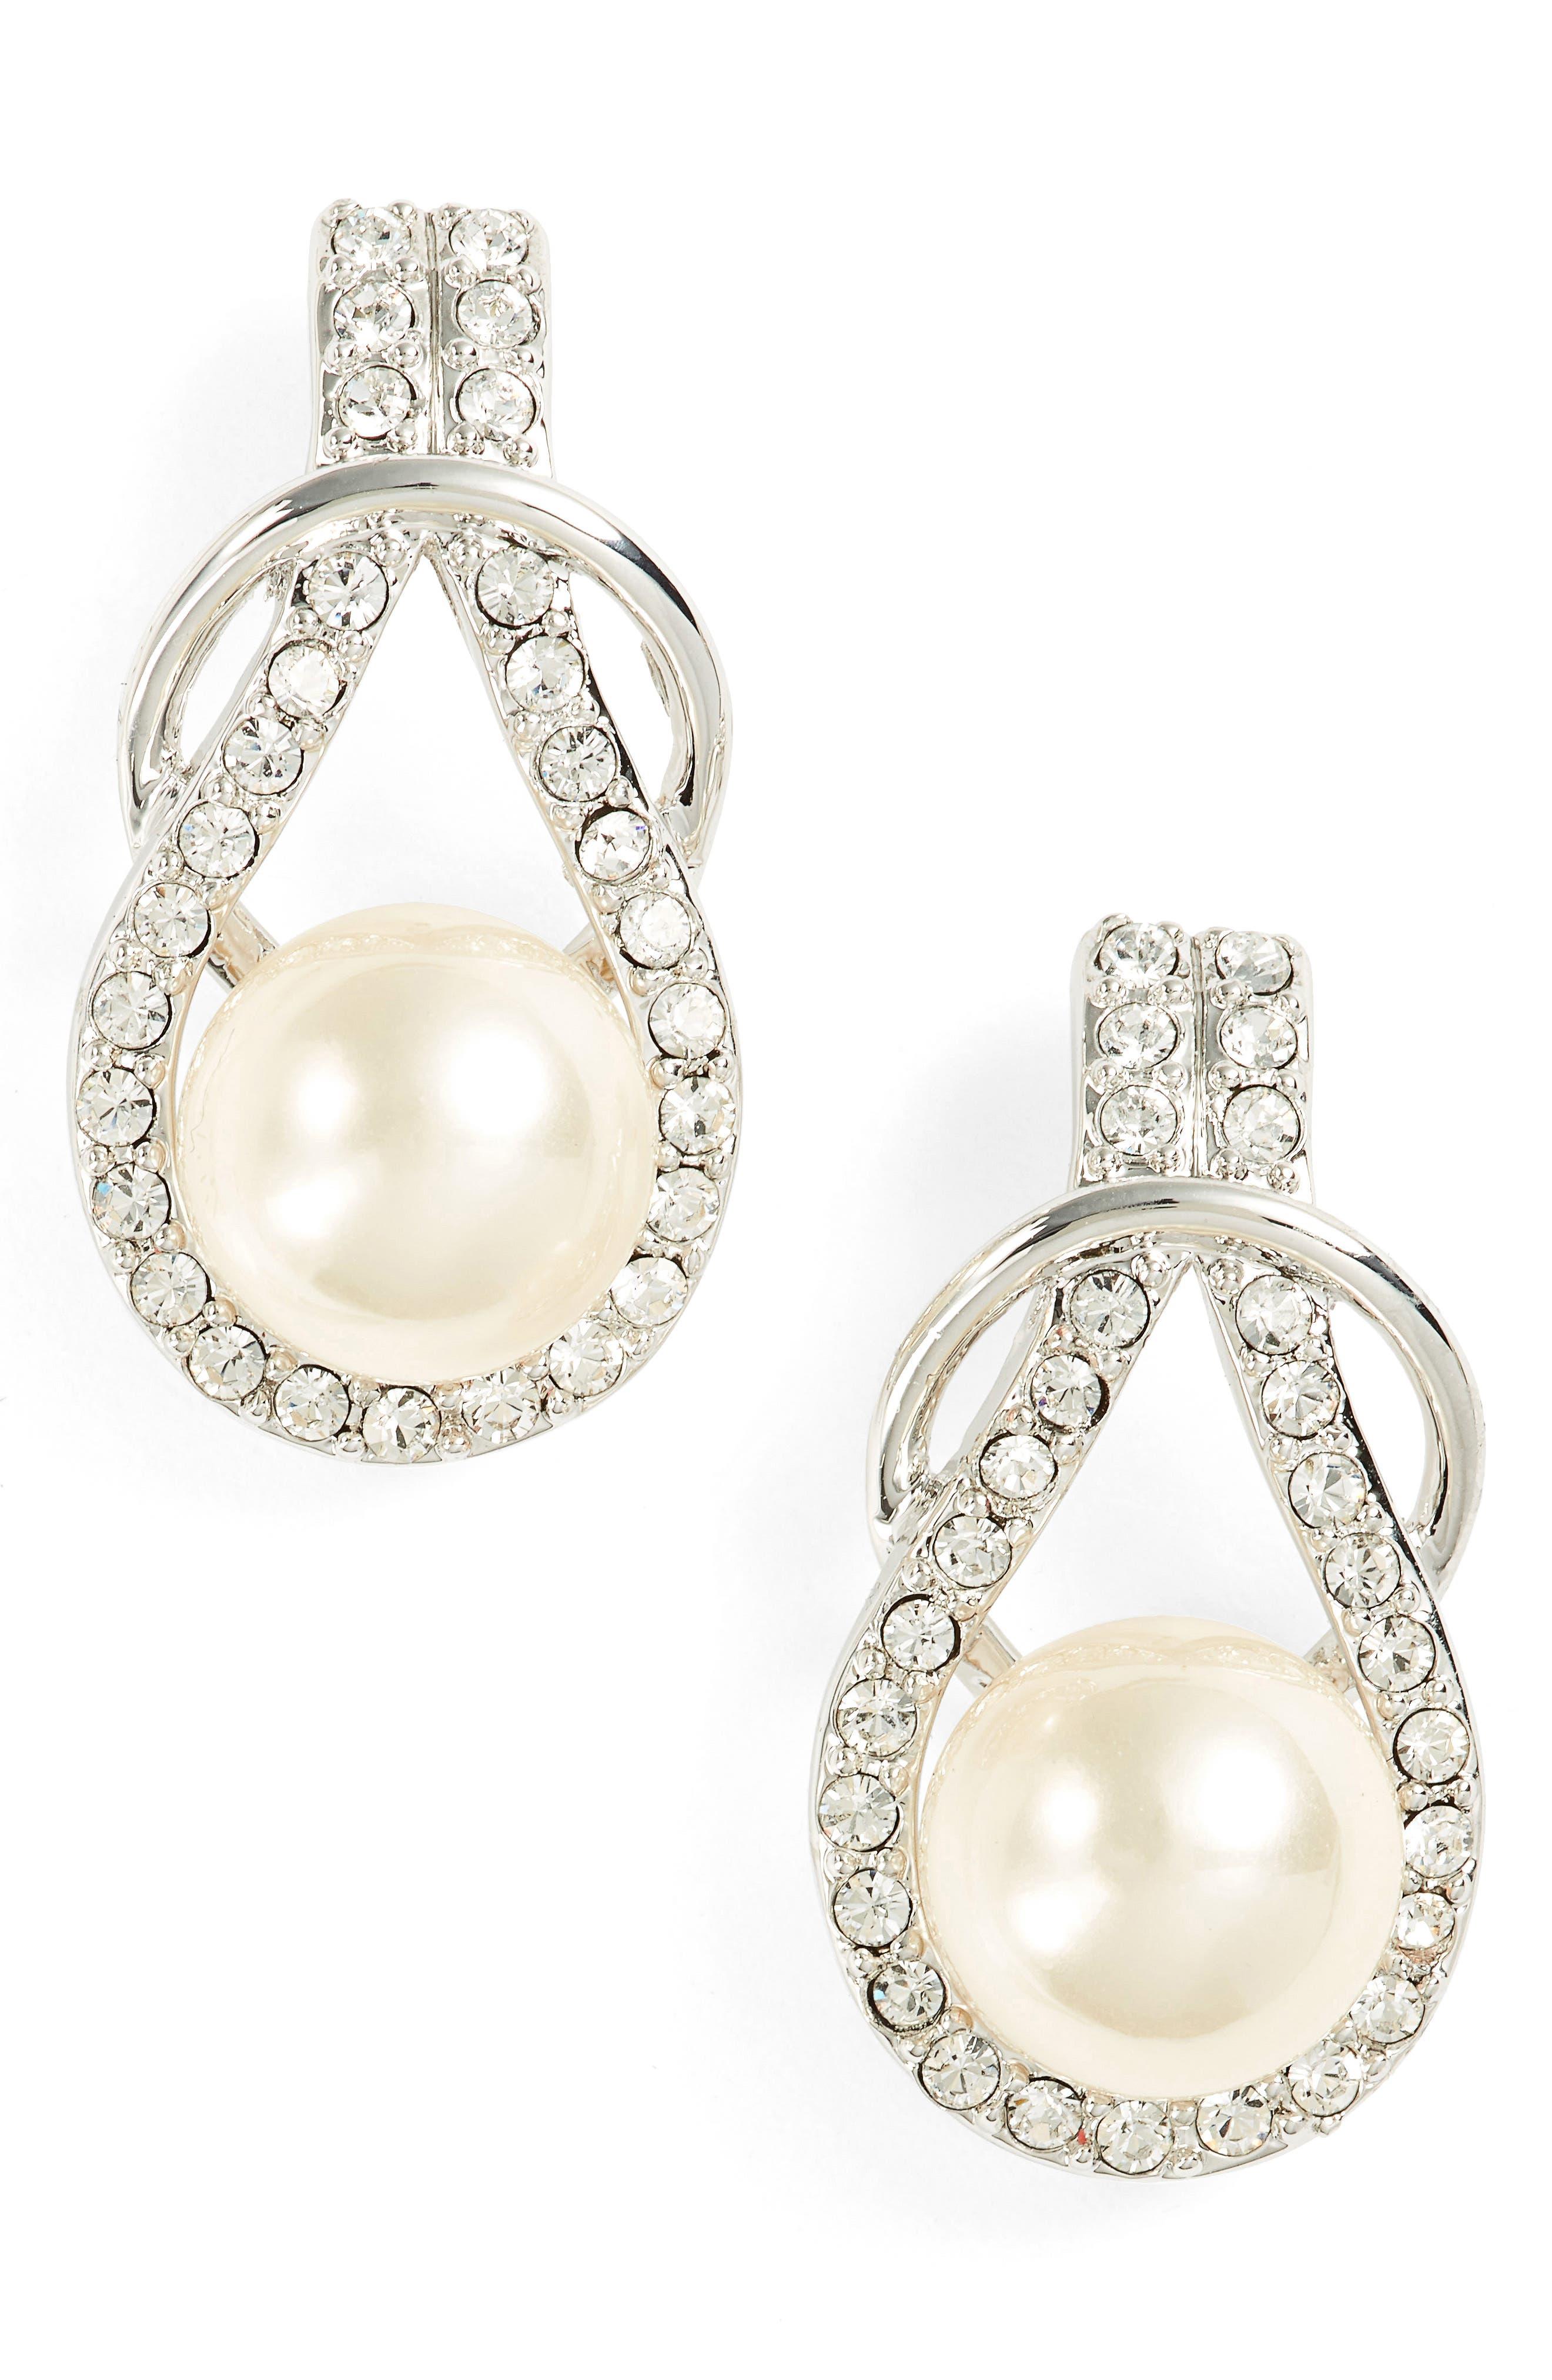 Knot Imitation Pearl Drop Earrings,                             Main thumbnail 1, color,                             IVORY PEARL / SILVER